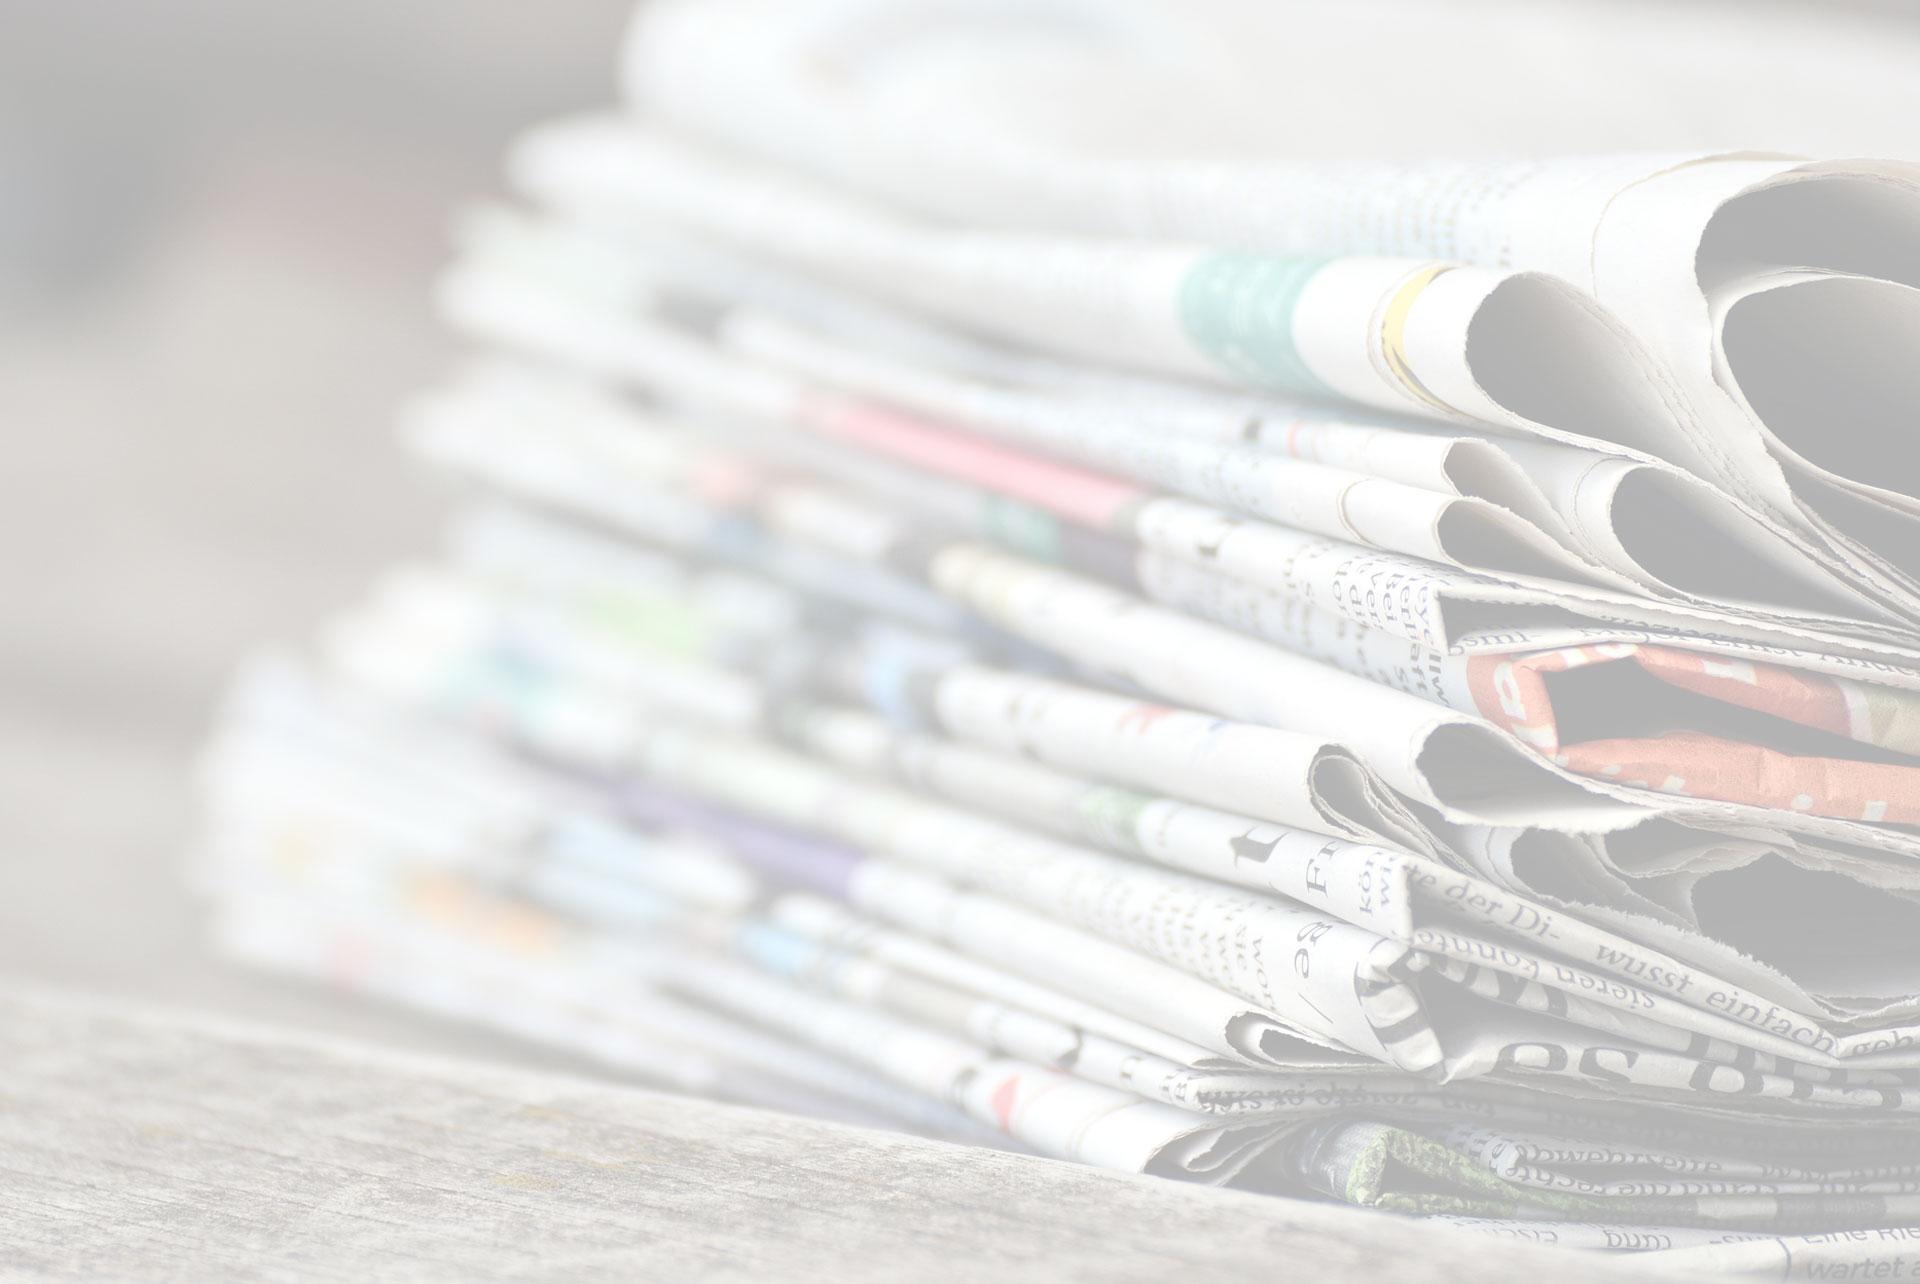 Turista austriaca partorisce in spiaggia a Cattolica: non sapeva di essere incinta